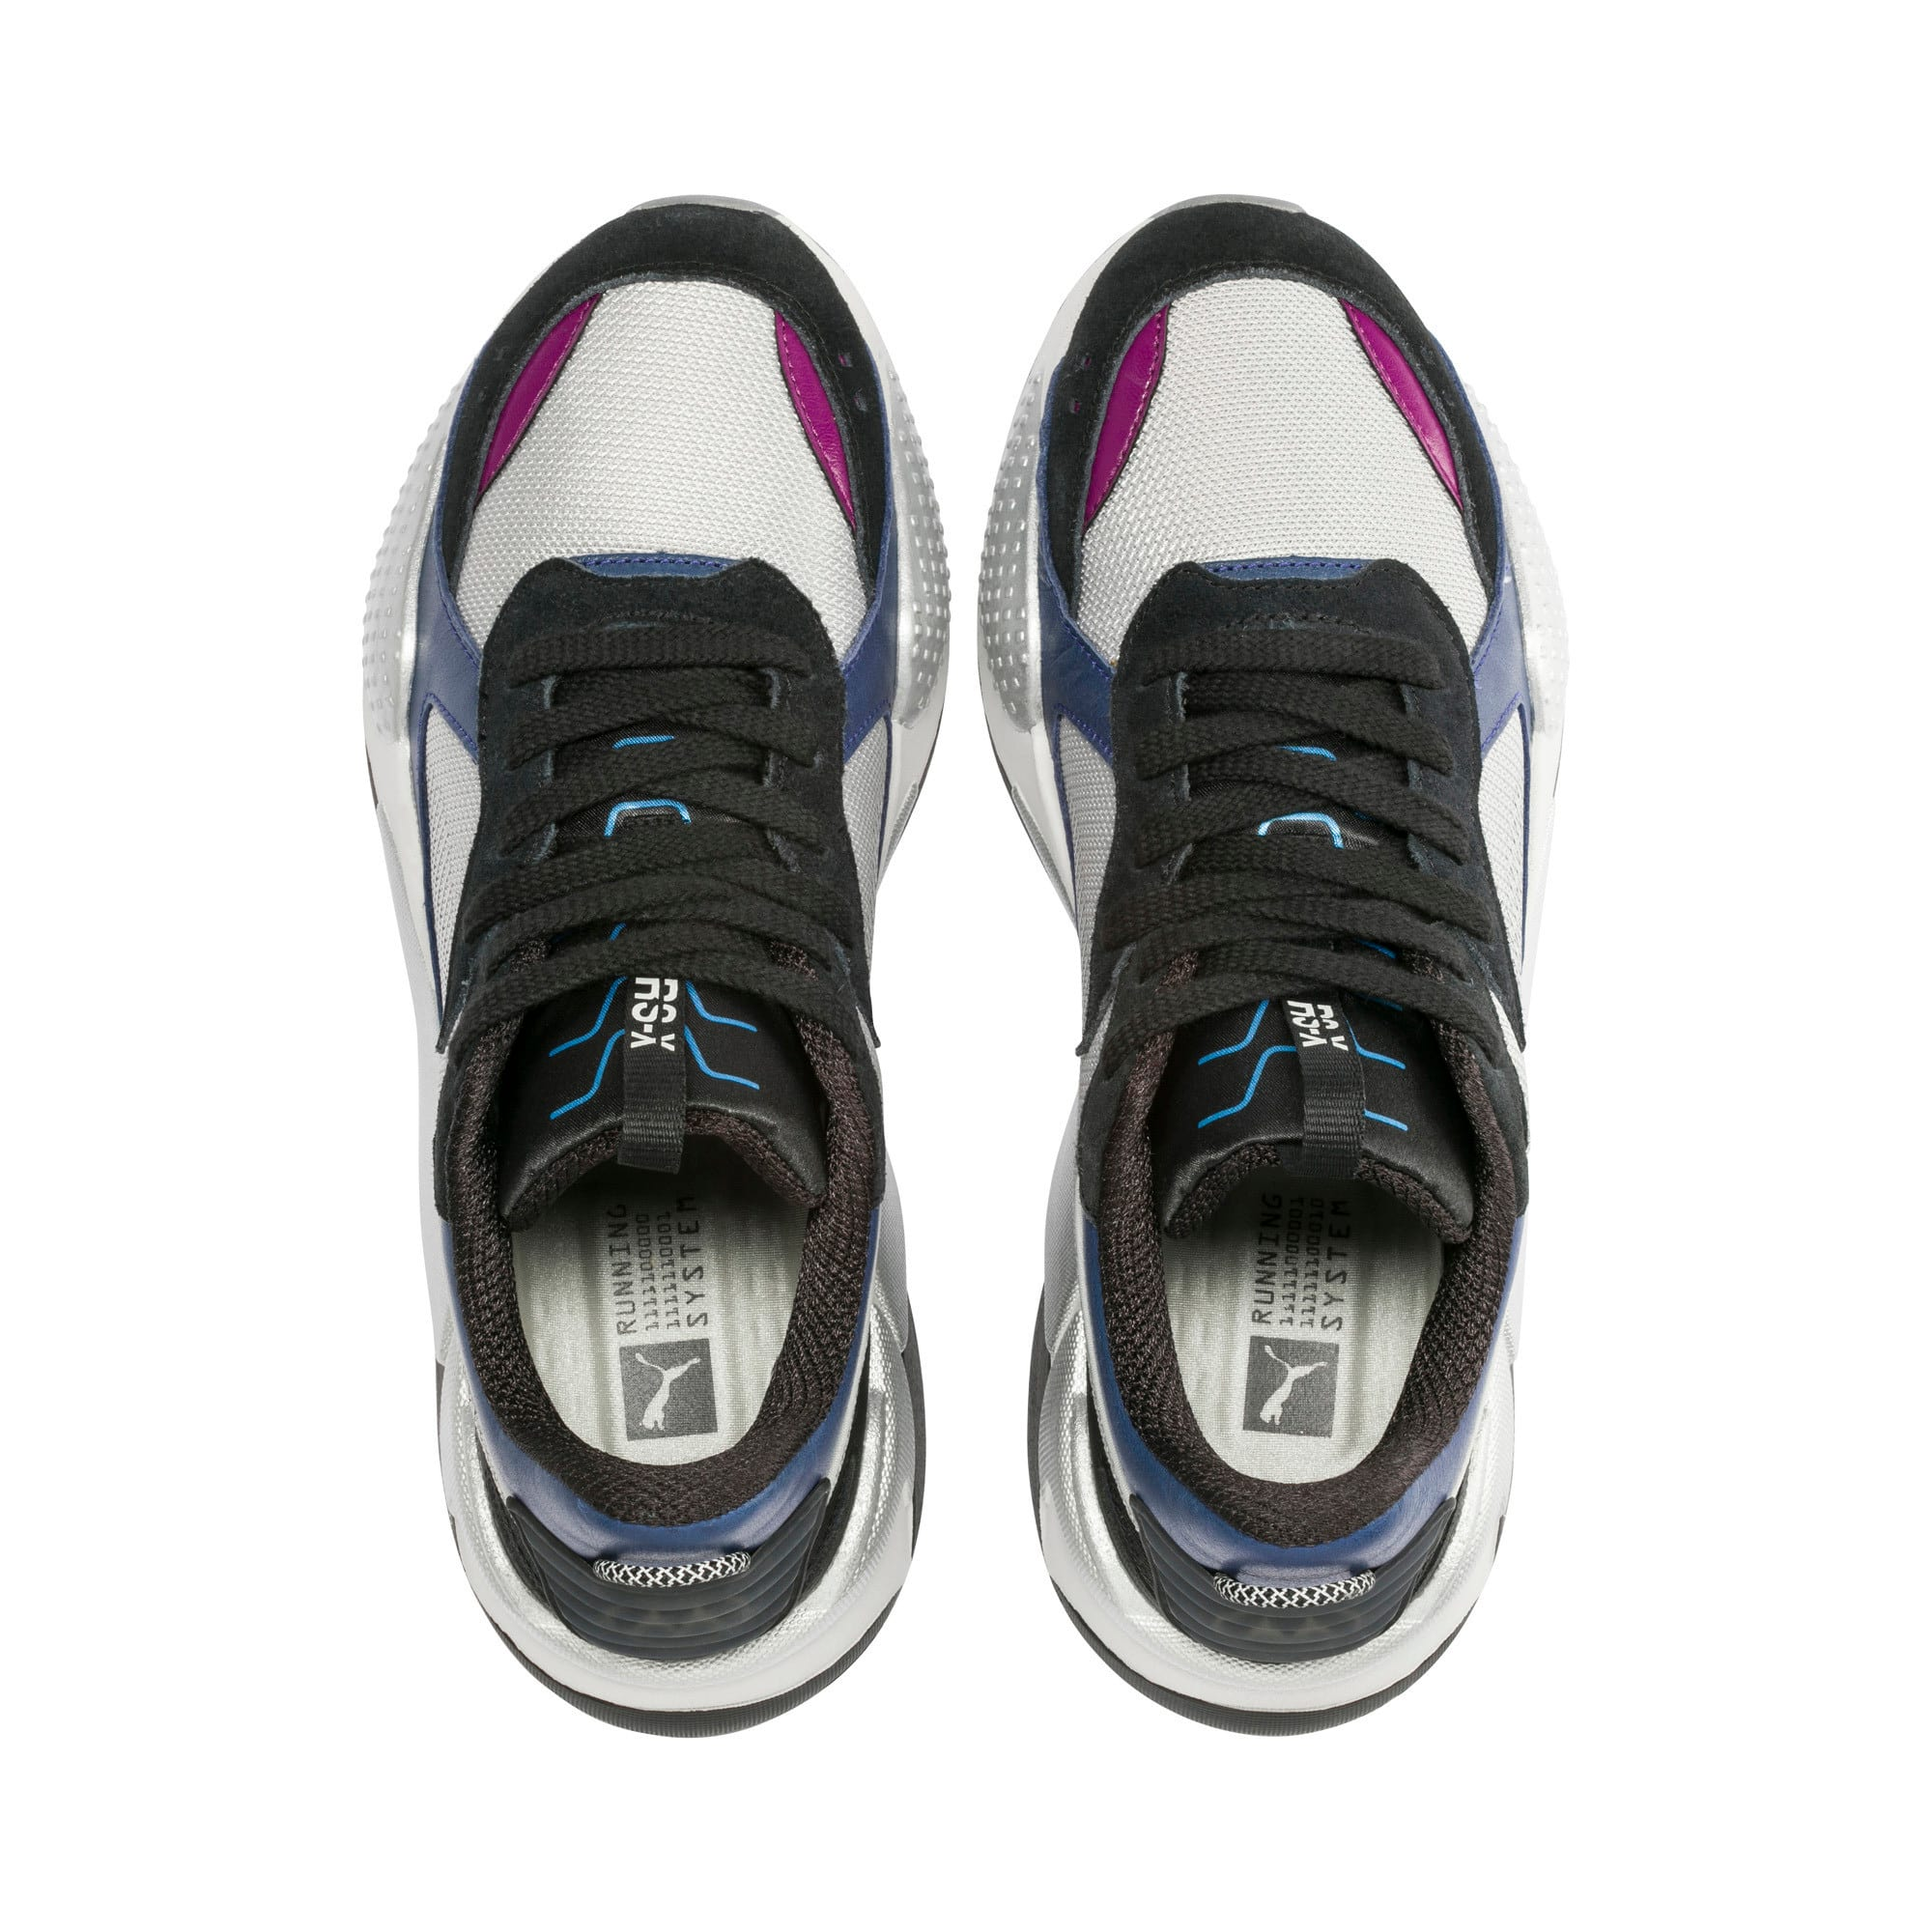 Thumbnail 6 of RS-X Tech Motorola Sneakers, Puma Silver-Sodalite Blue, medium